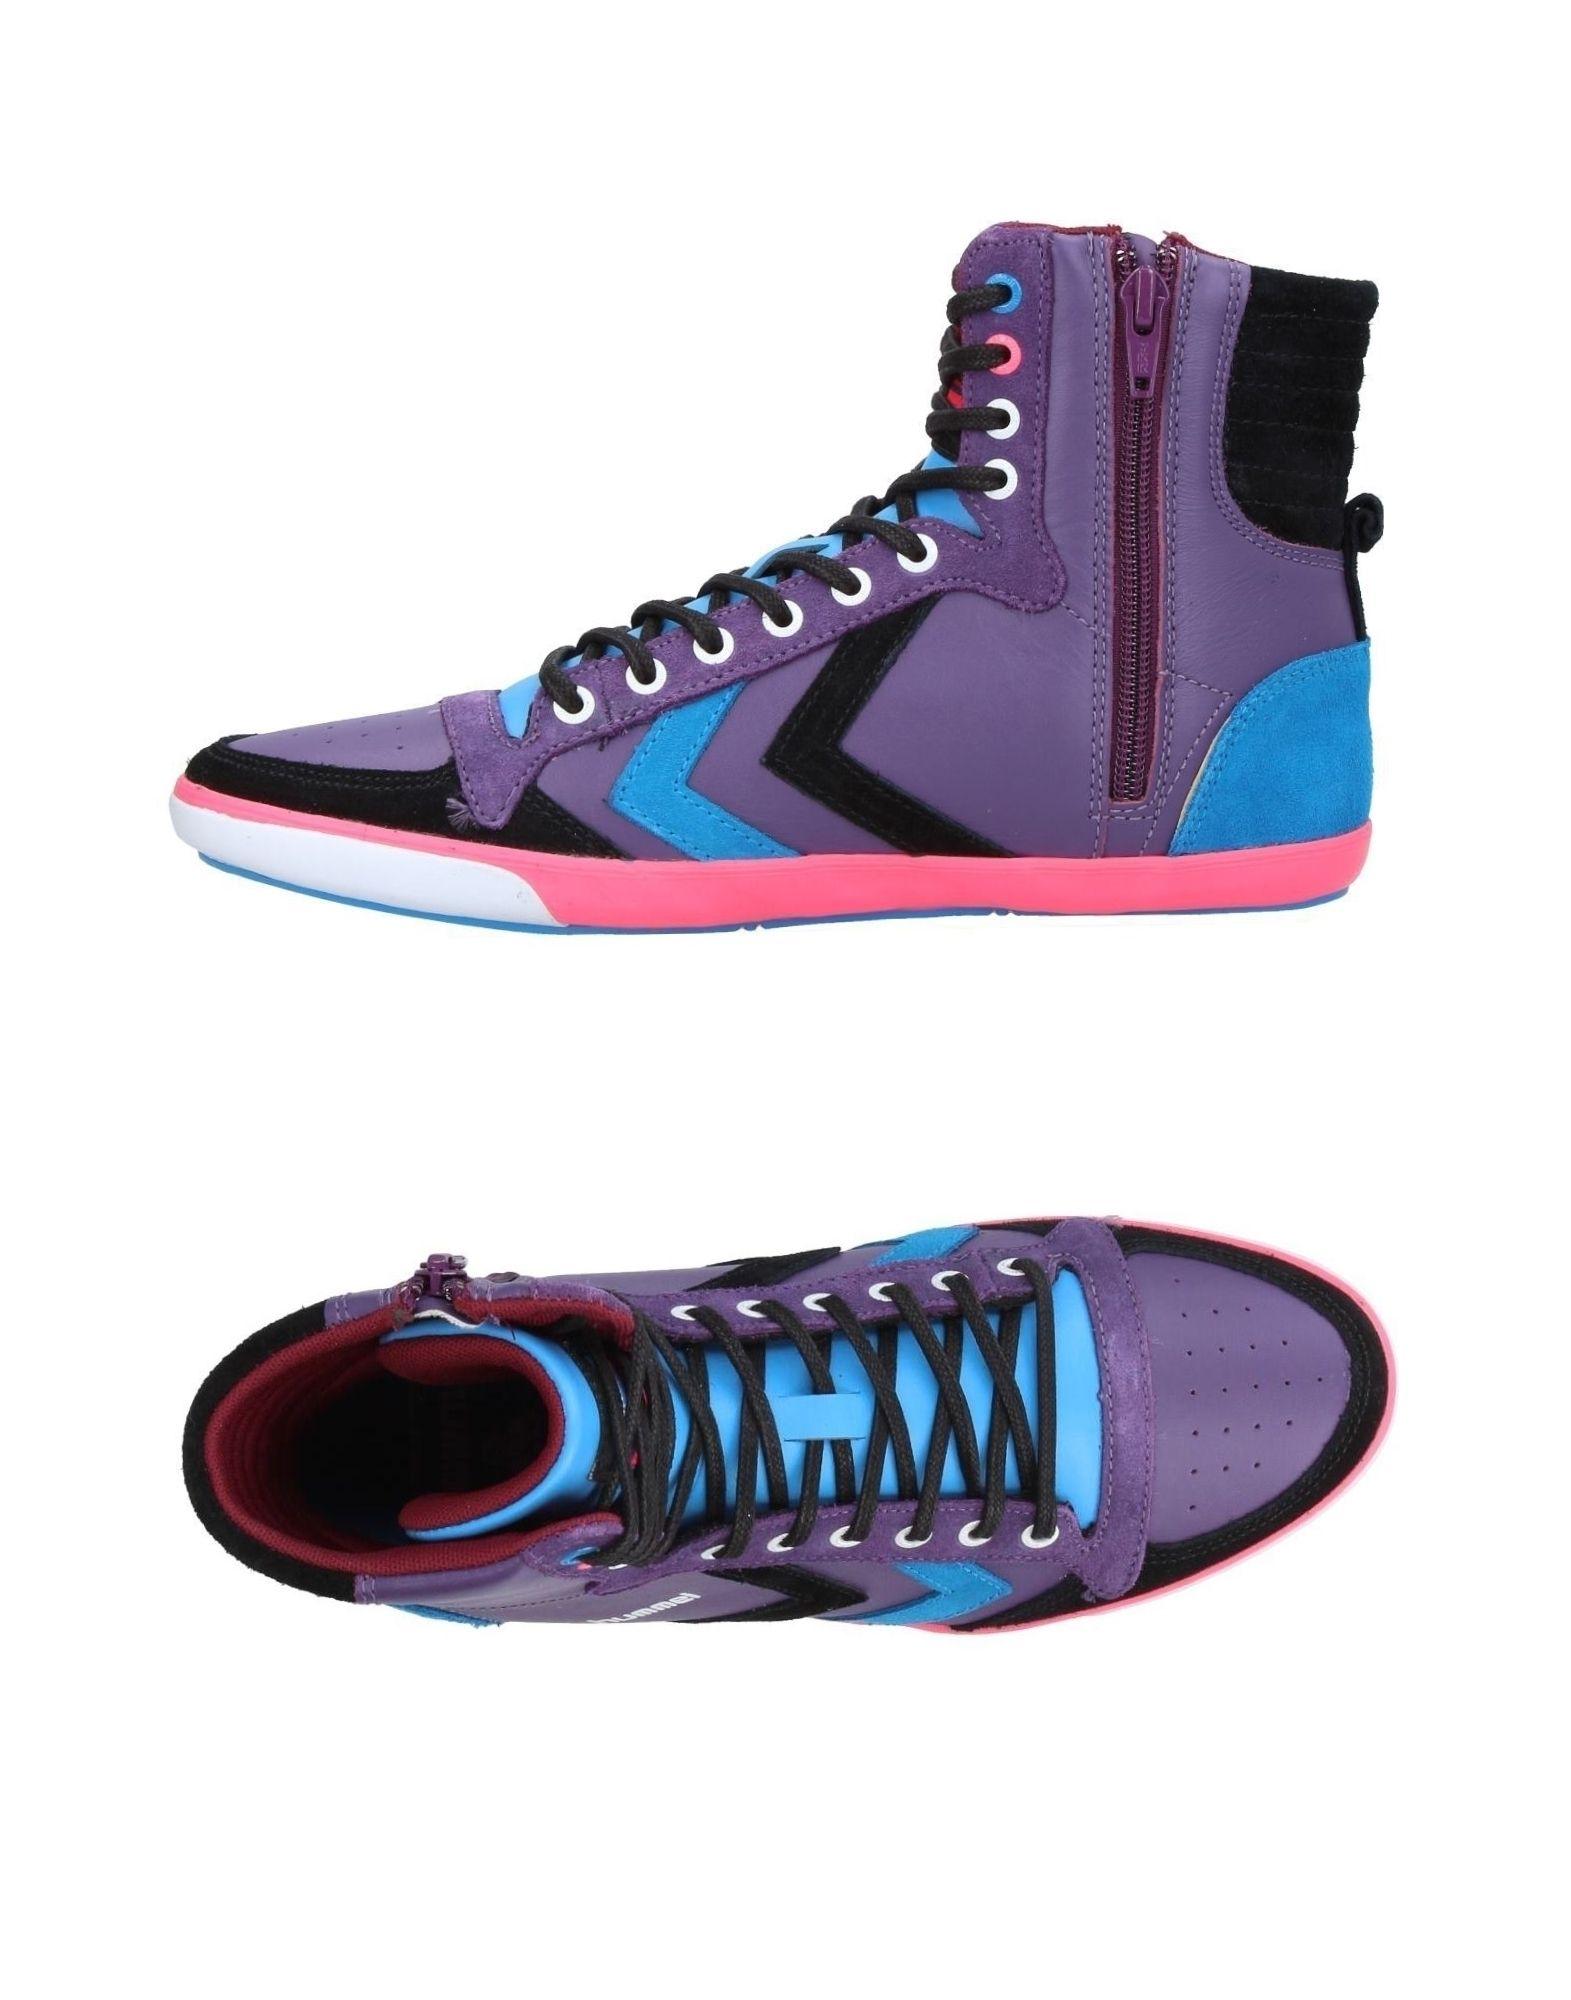 Sneakers Hummel Femme - Sneakers Hummel sur